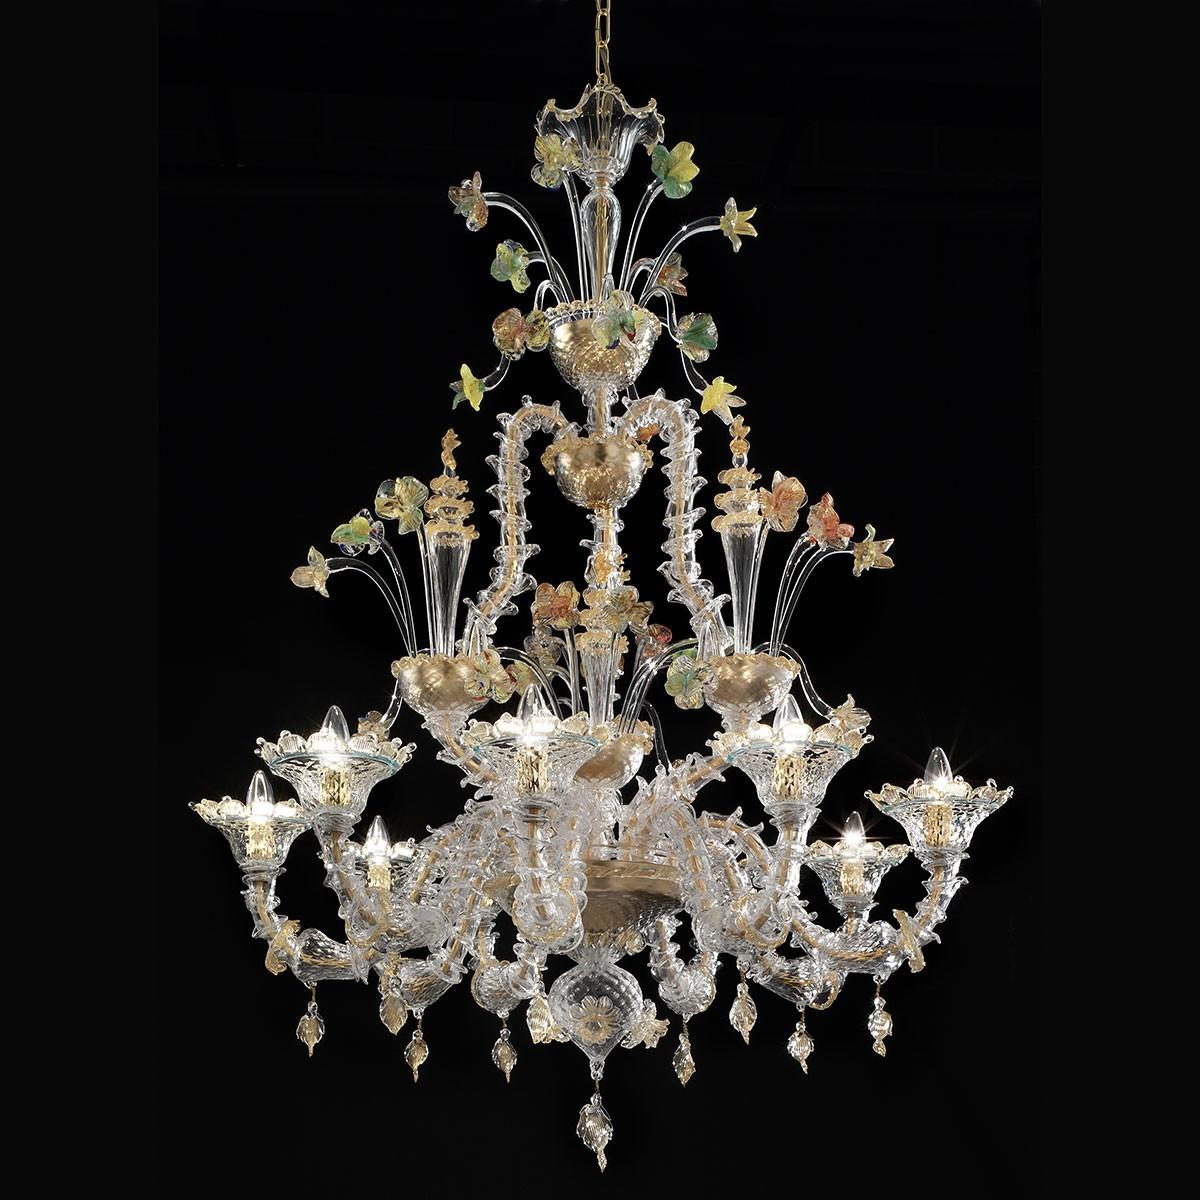 """Santa Caterina"" Murano glas Kronleuchter - 9 flammig - transparent gold polychrome"